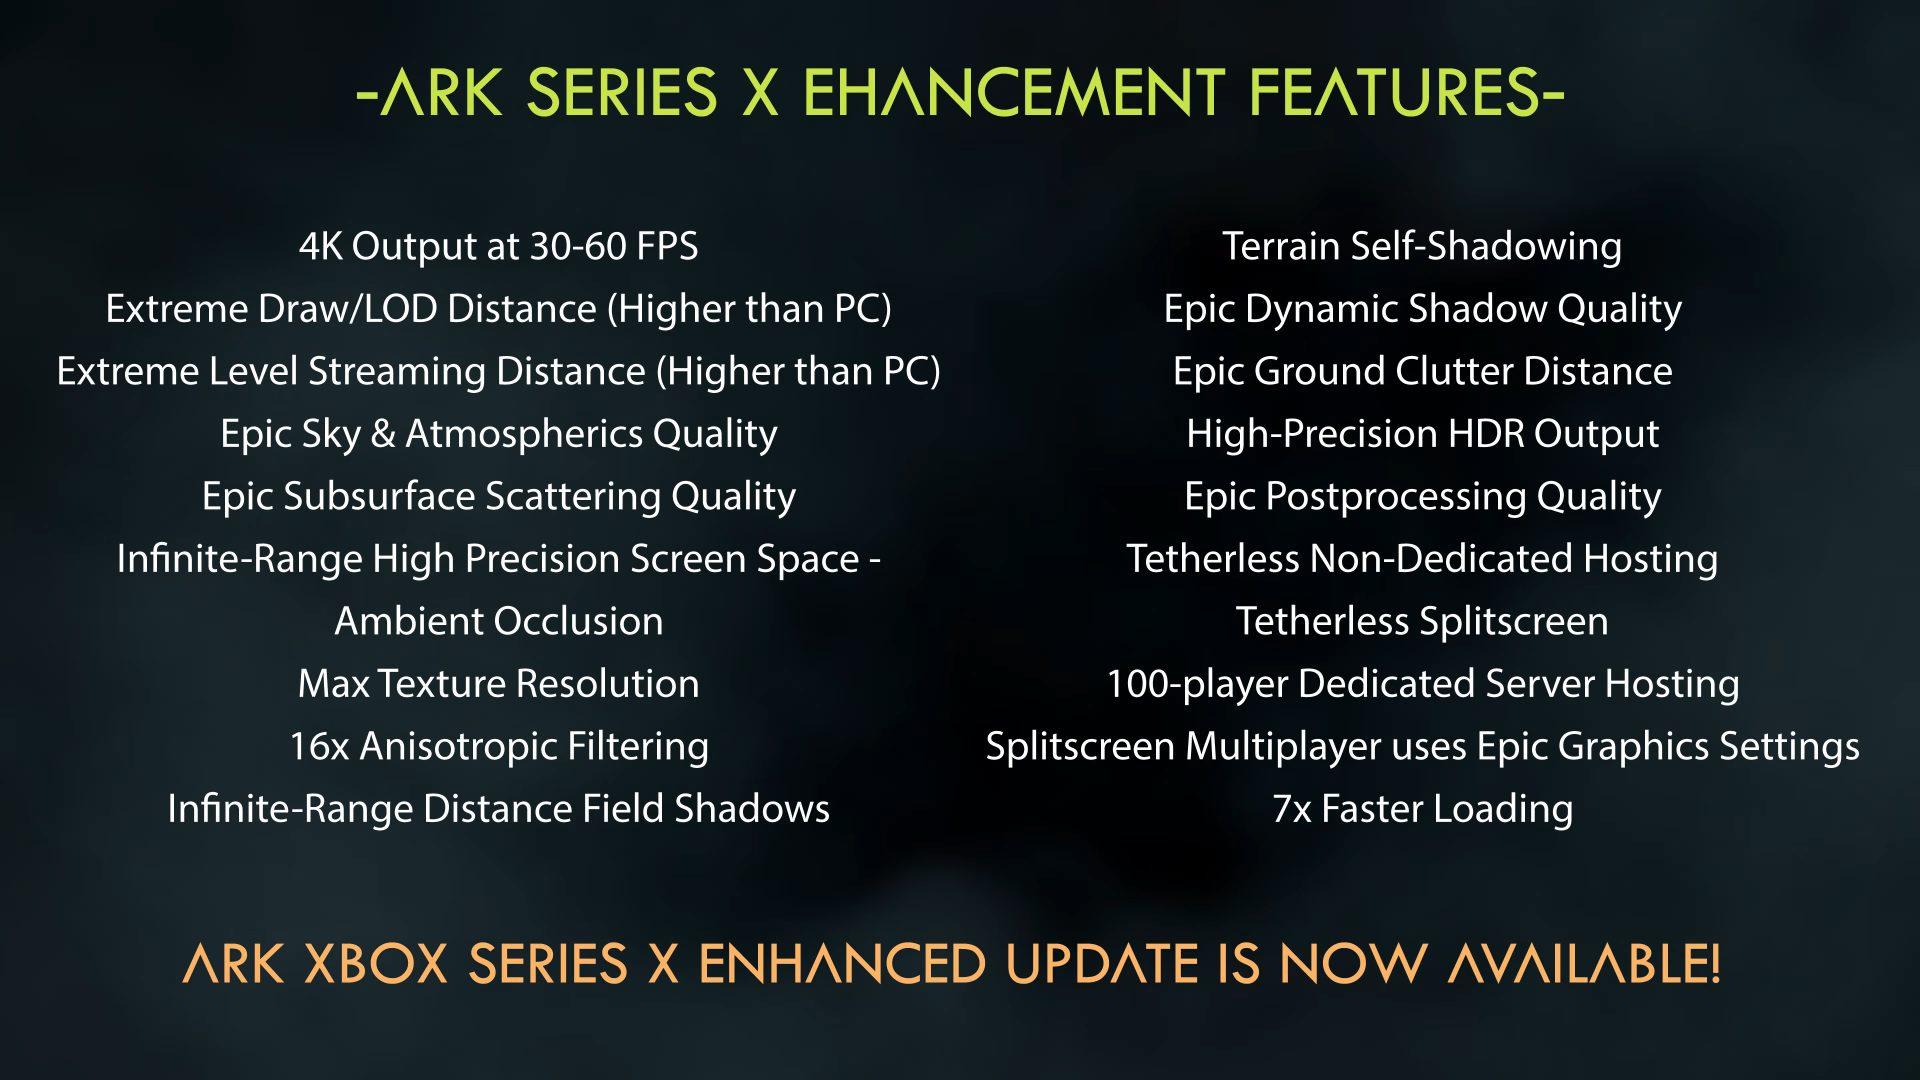 ¡Brutal! Así aprovecha ARK: Survival Evolved el hardware de Xbox Series X